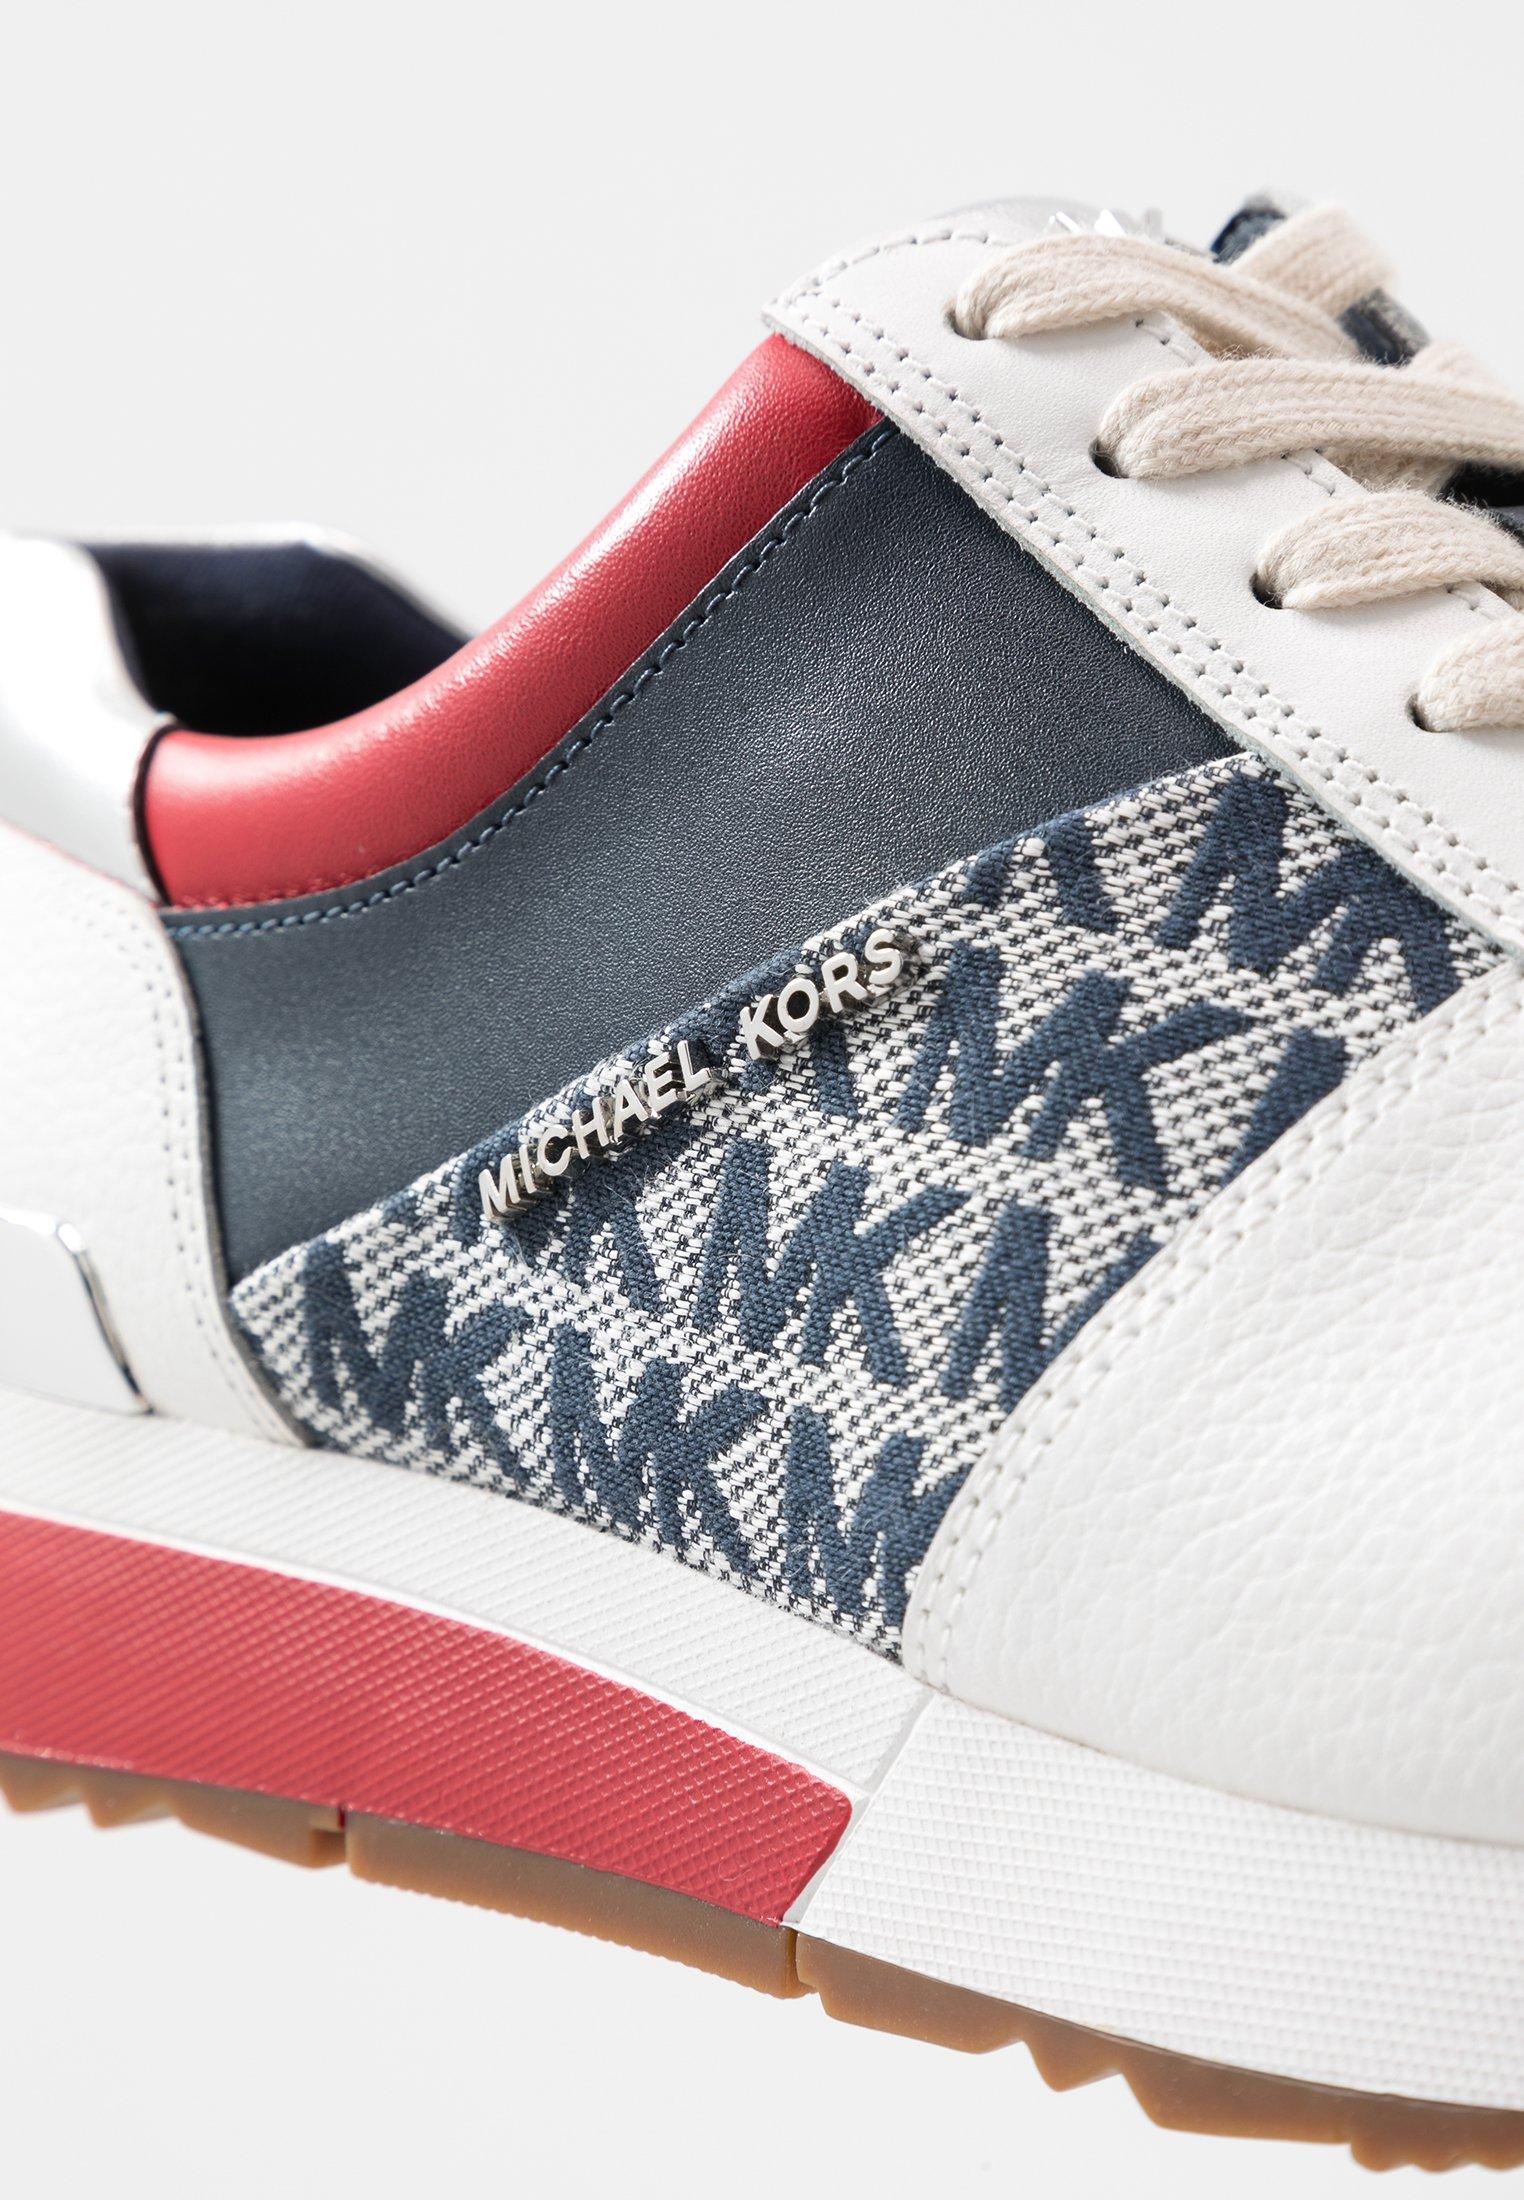 Michael Kors Sneakers - Ivory/denim